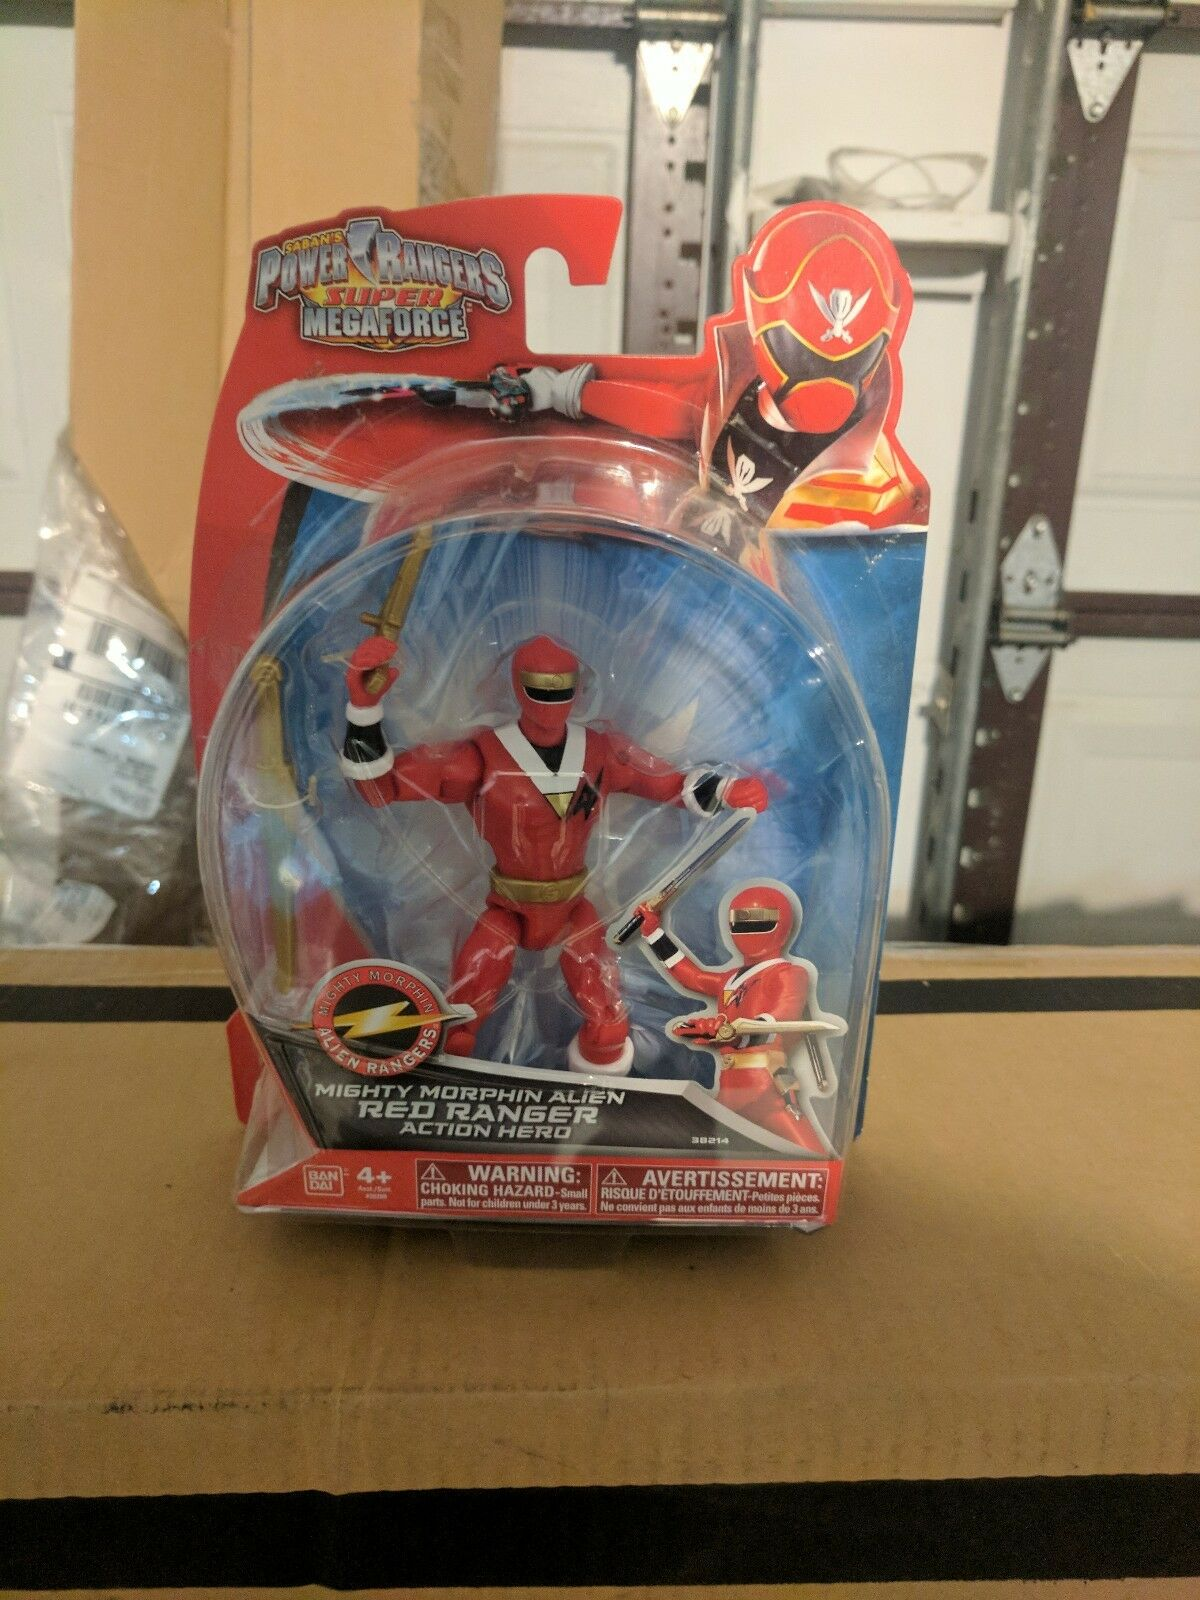 Power Rangers Super MegaForce Mighty Morphin Alien Red Ranger Action Hero